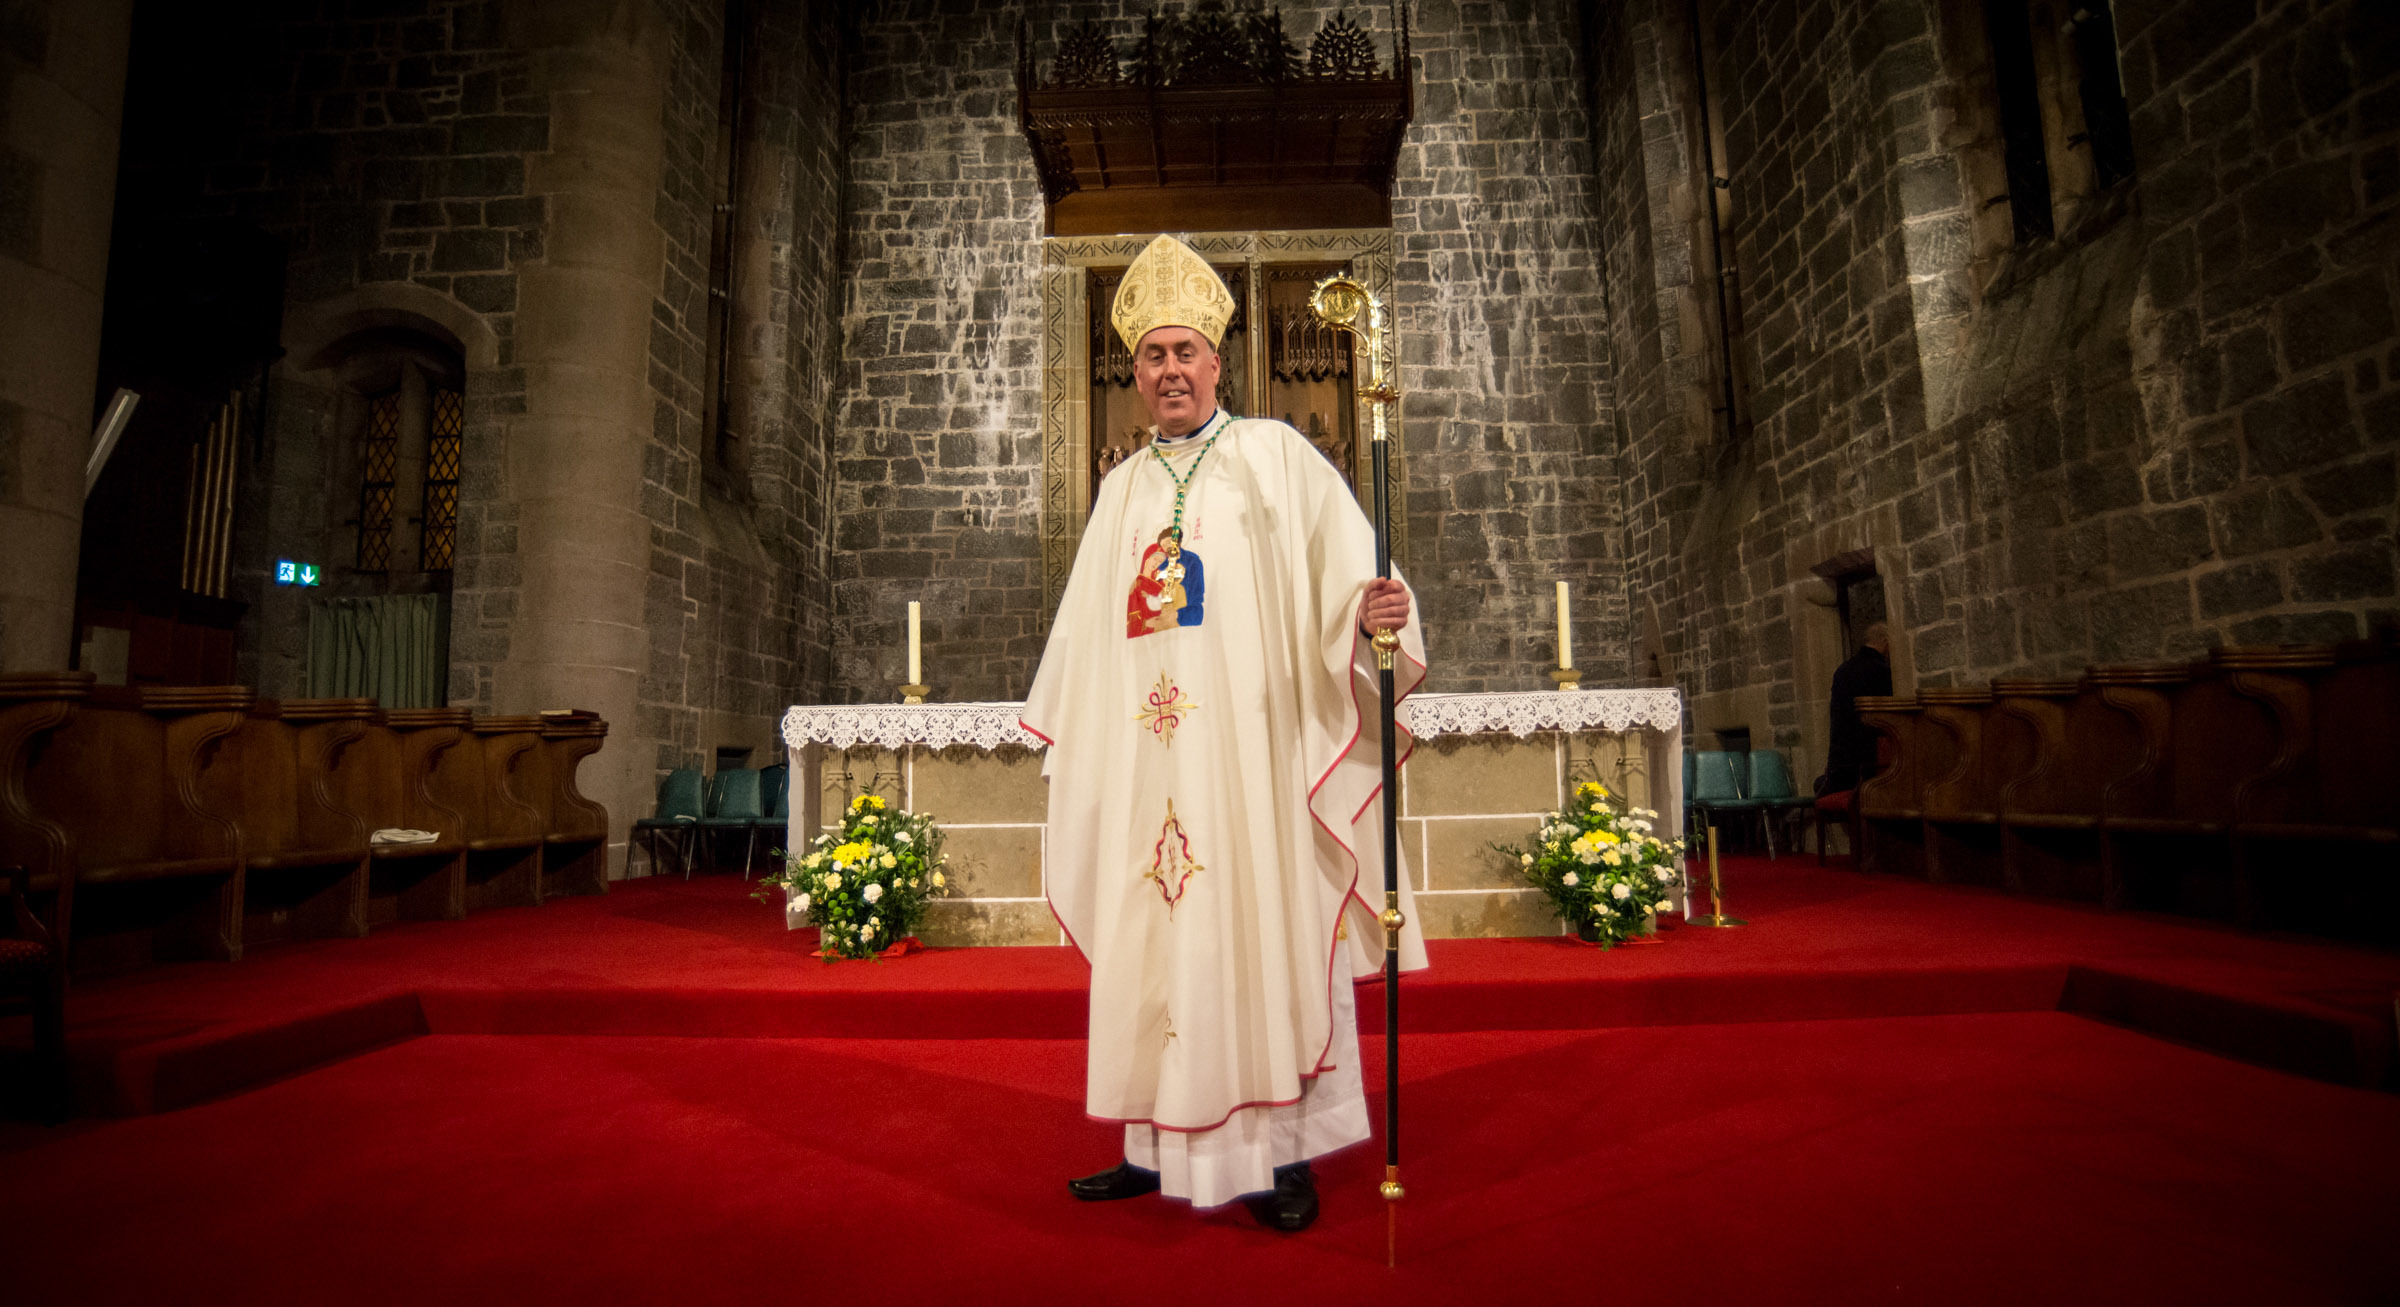 Bishop Brian McGee